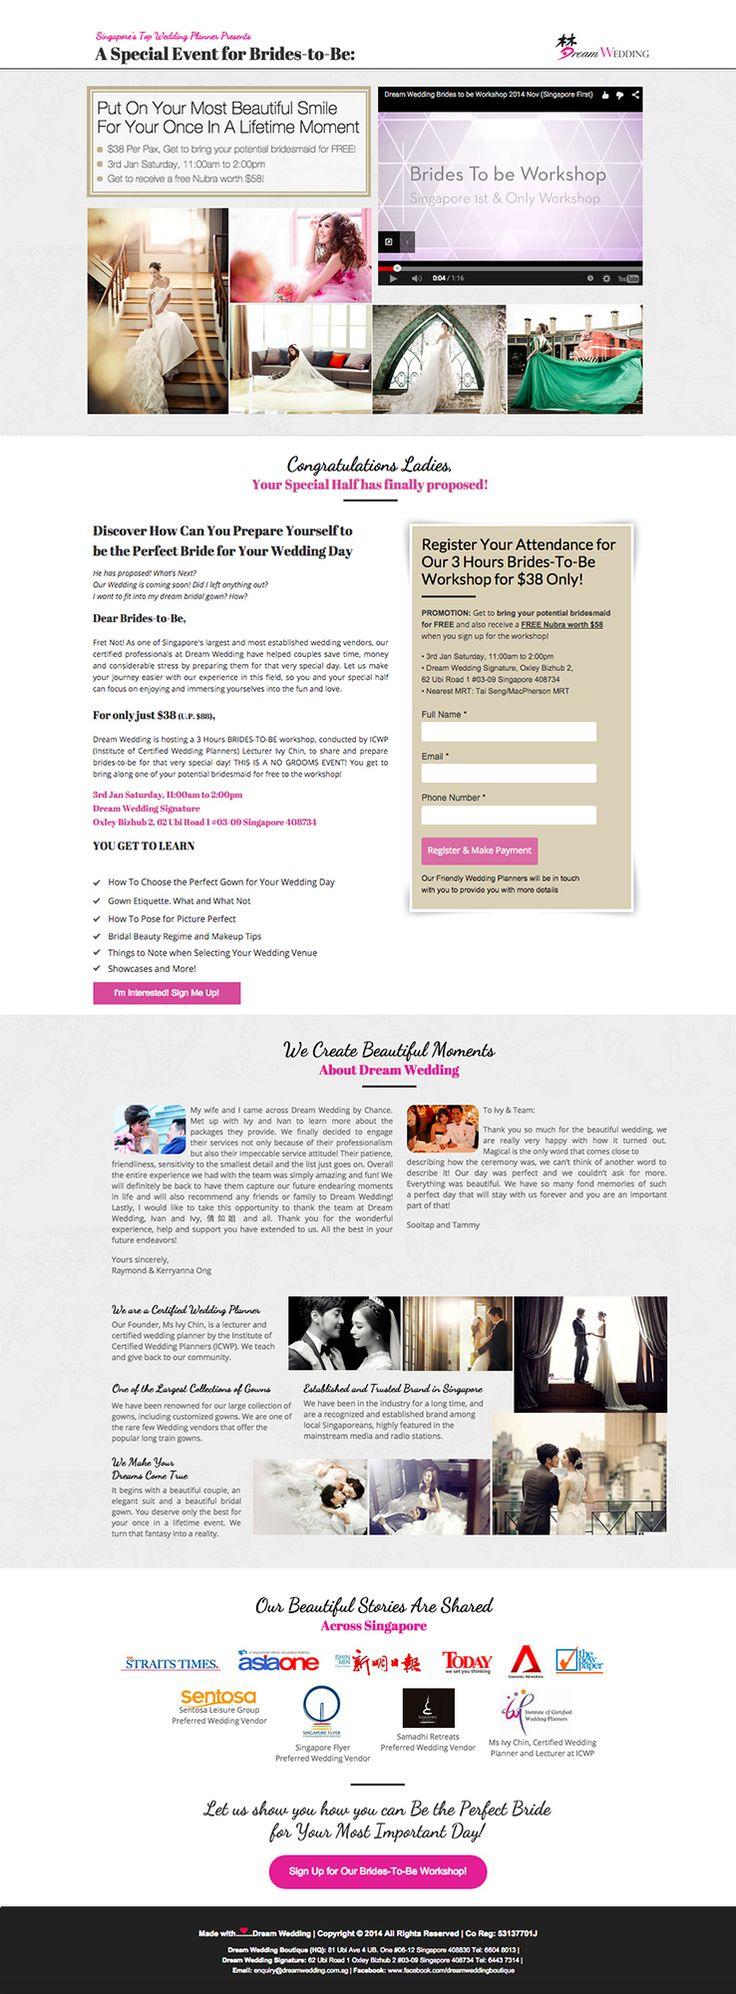 Dream Wedding Boutique | Desktop Sales Page: Brides-To-Be Workshop